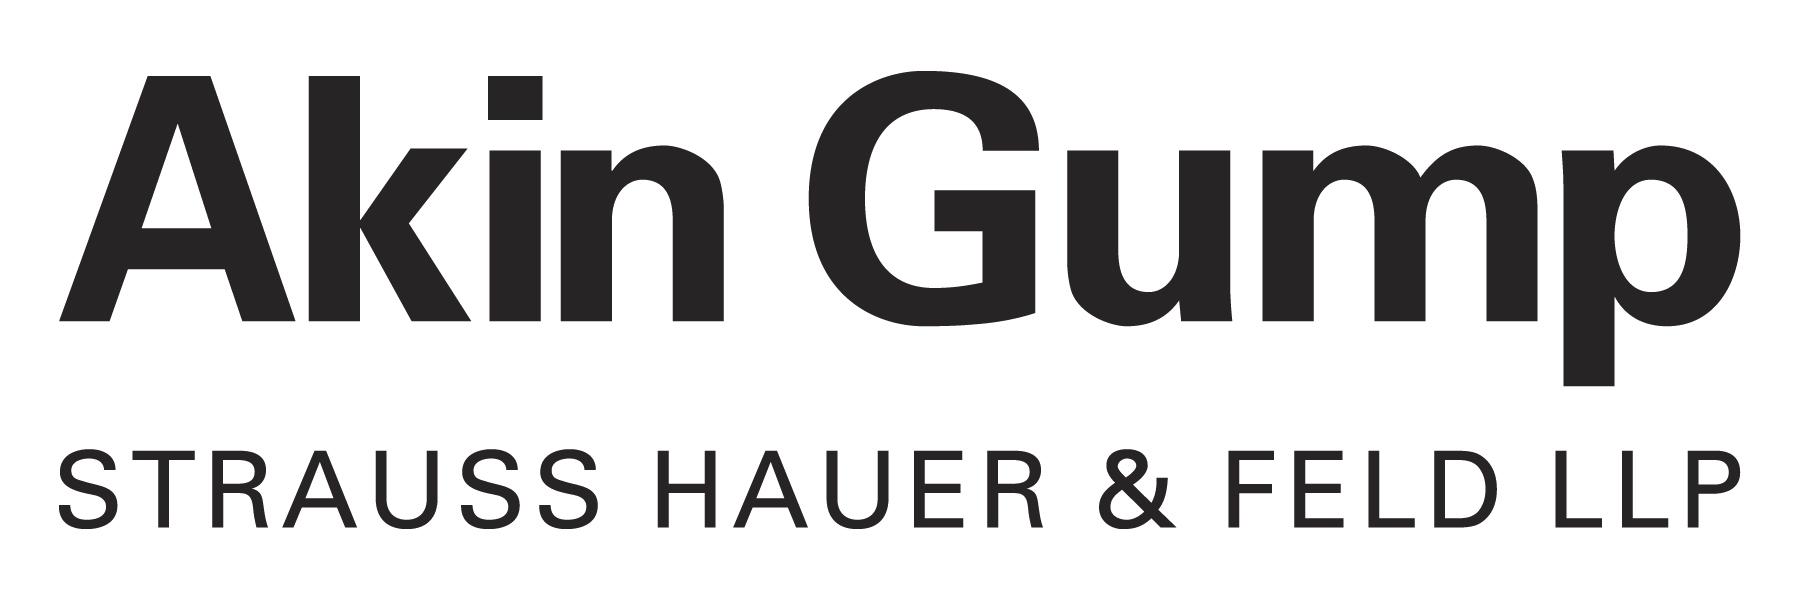 Akin Gump Streuss Hauer & Field LLP